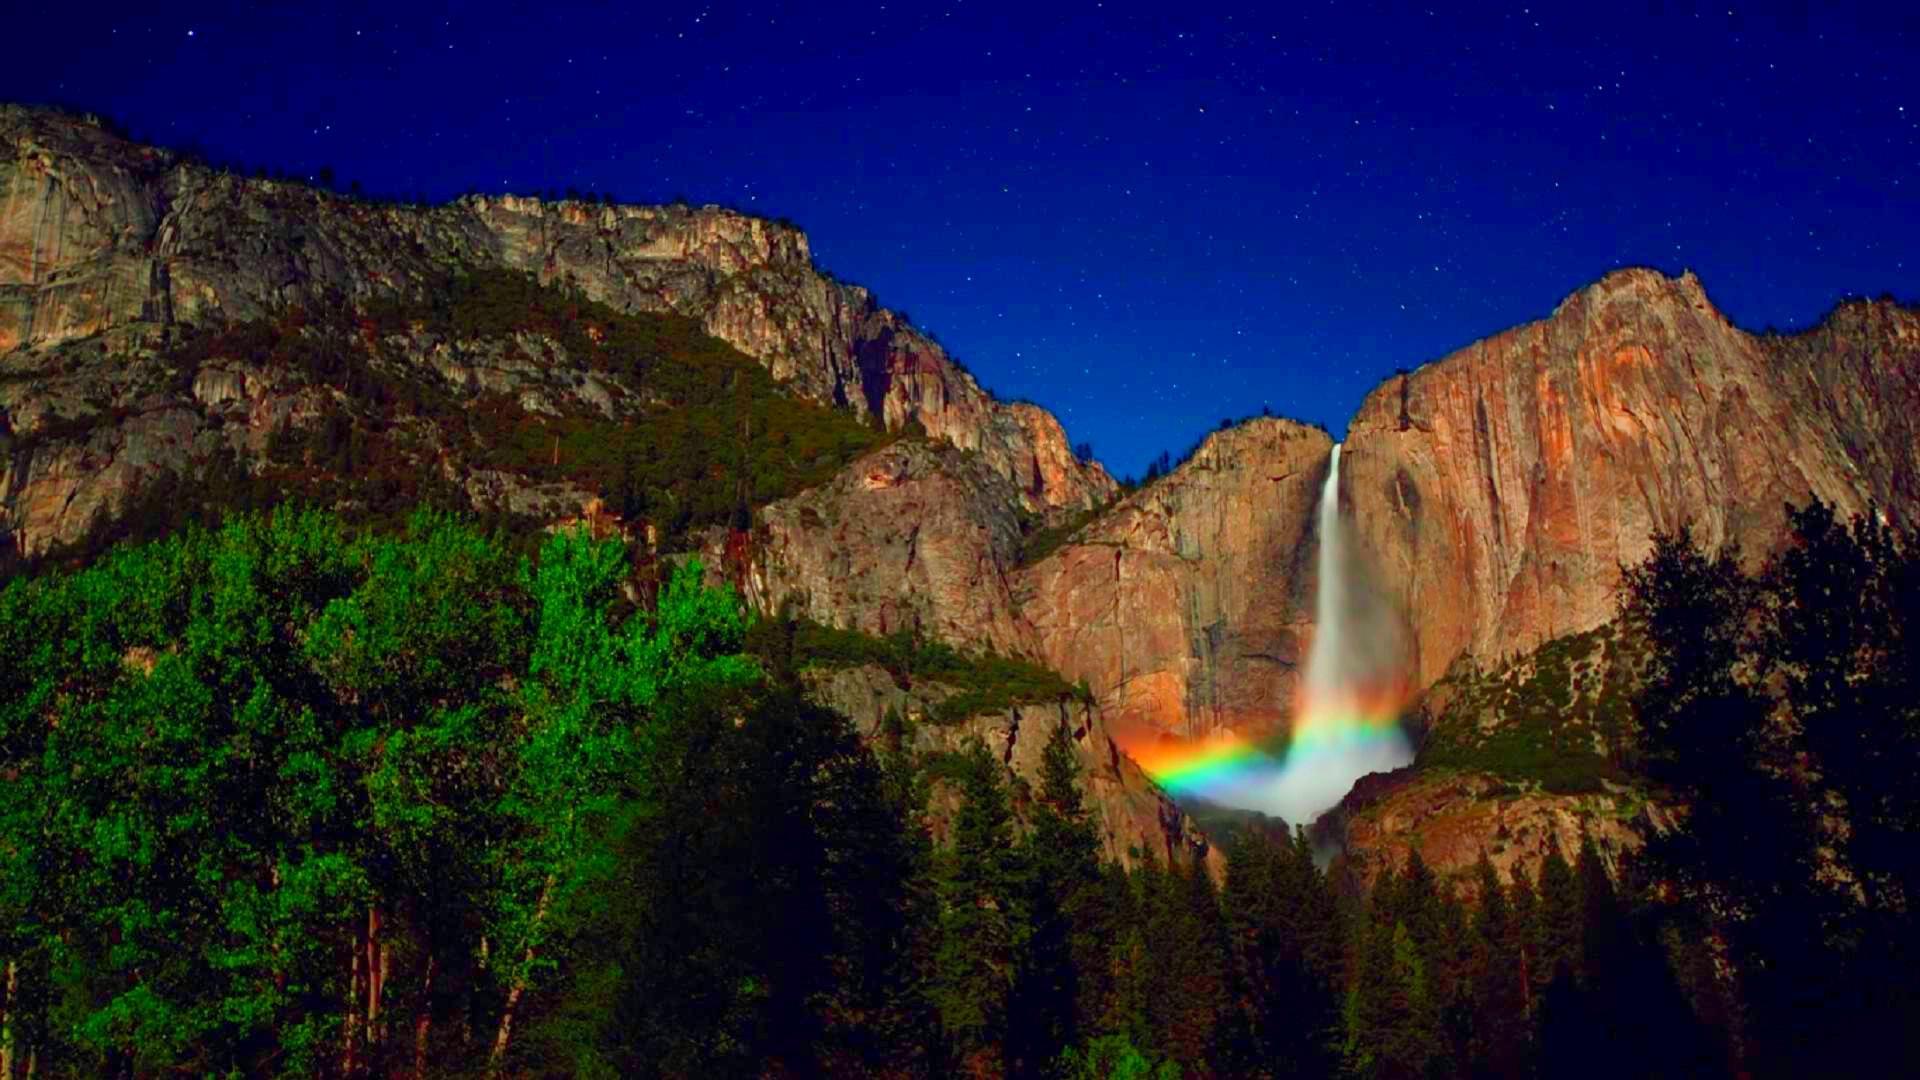 Niagara Falls Full Hd Wallpaper Yosemite Night Wallpaper Pixelstalk Net